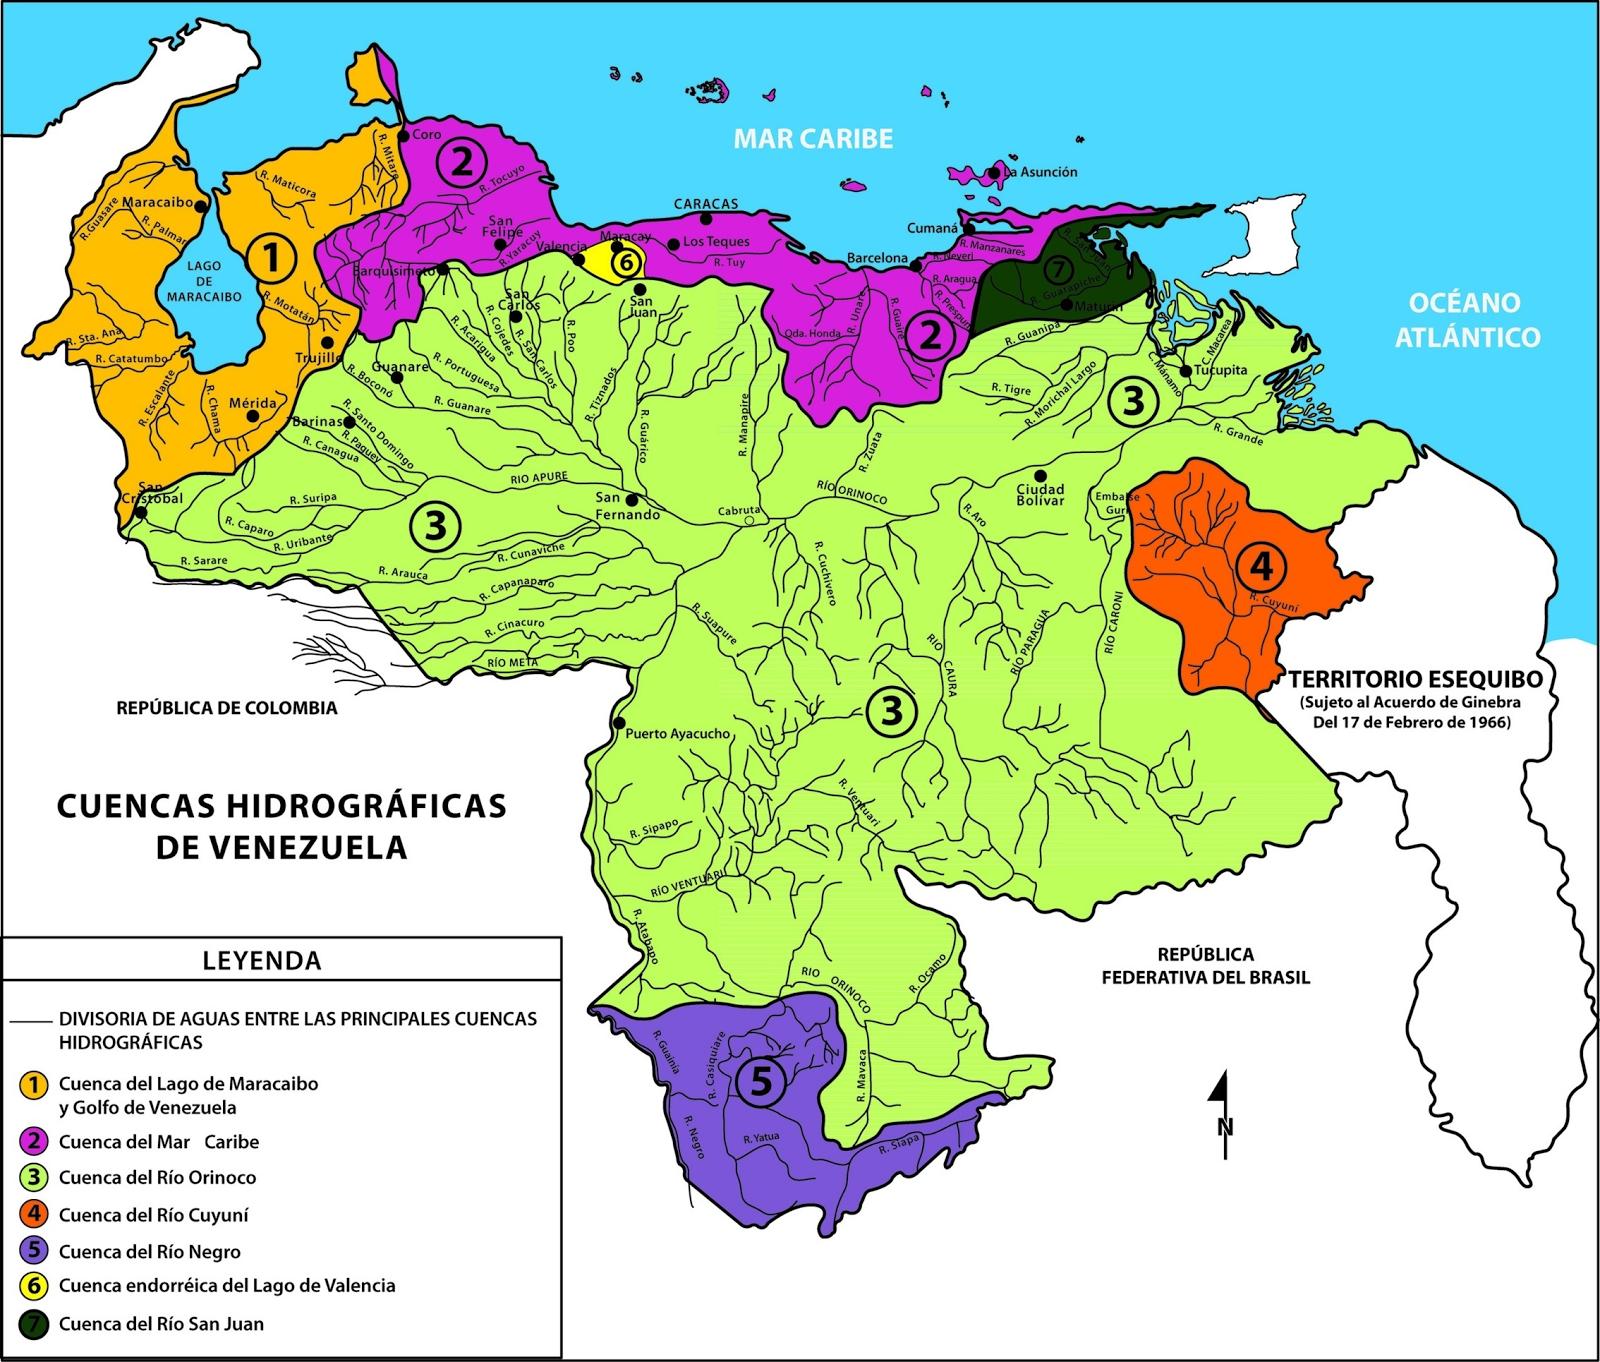 Geografia de venezuela hidrografa e hidrologa cuencas hidrograficas de venezuela fuente canaimaeducativogob altavistaventures Choice Image